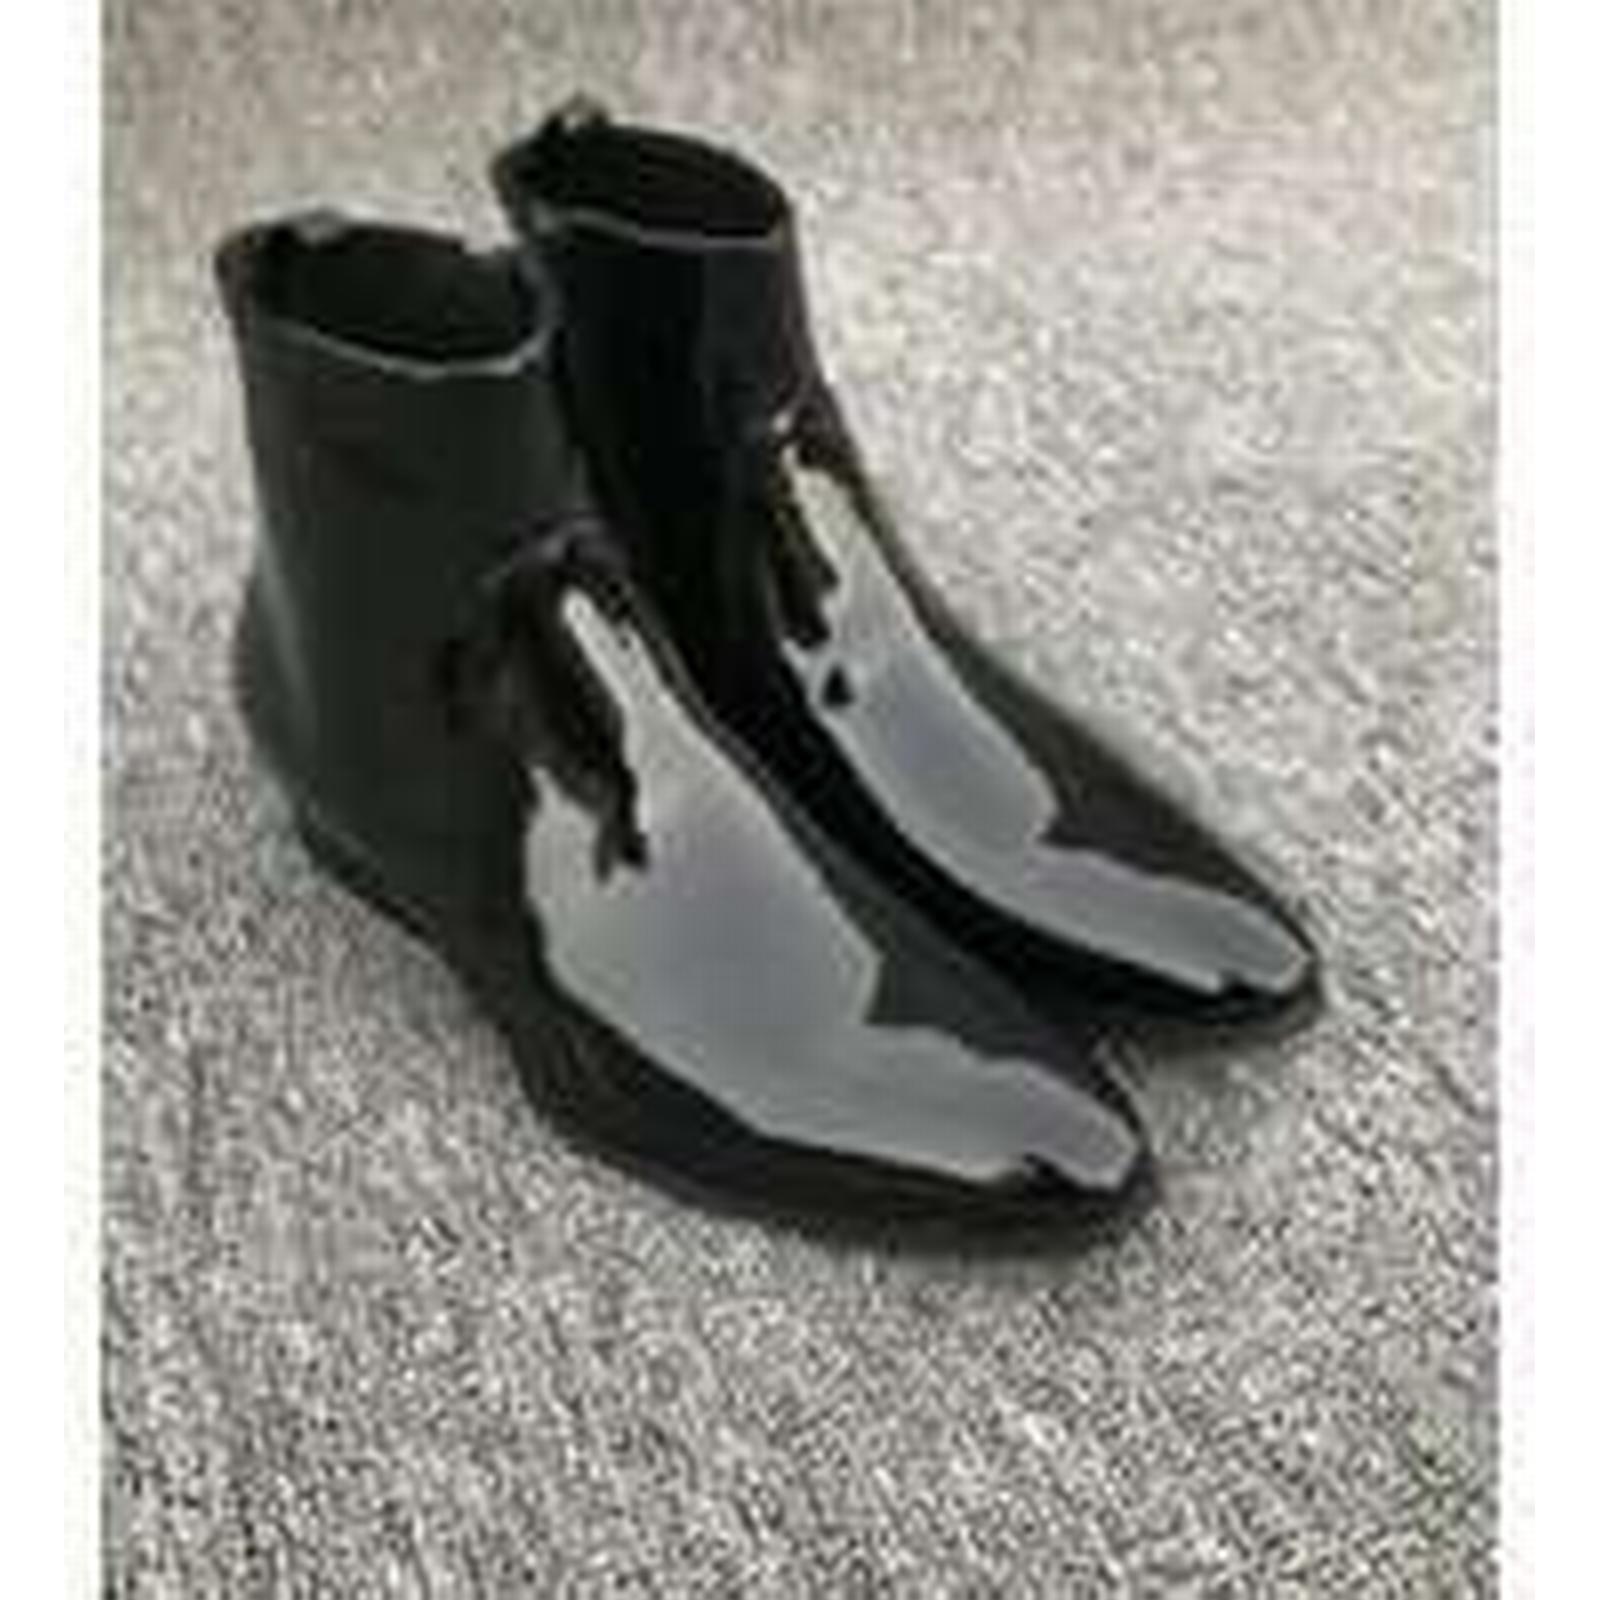 Bonanza (Global) Men Men Black Patent Leather Boots, Men Men Side Zipper Pointed Toe Ankle Boot, Men boot 36605a